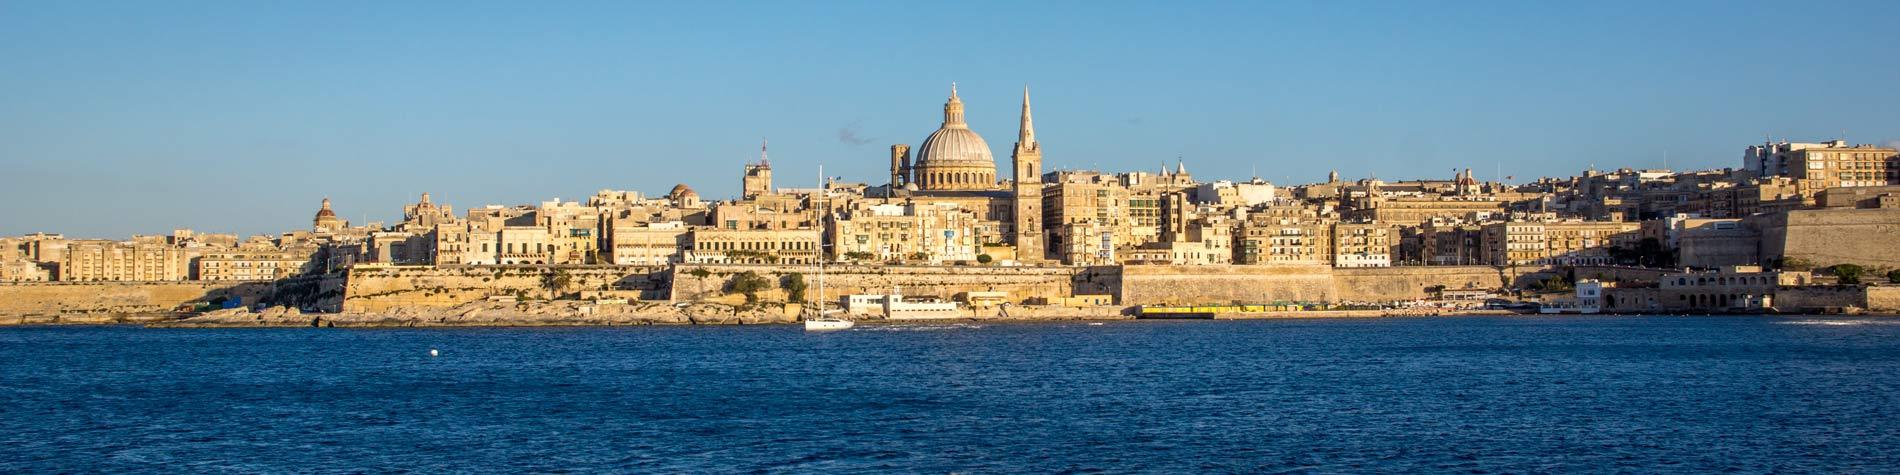 Cheap flights to Malta (MLA) | Ryanair.com